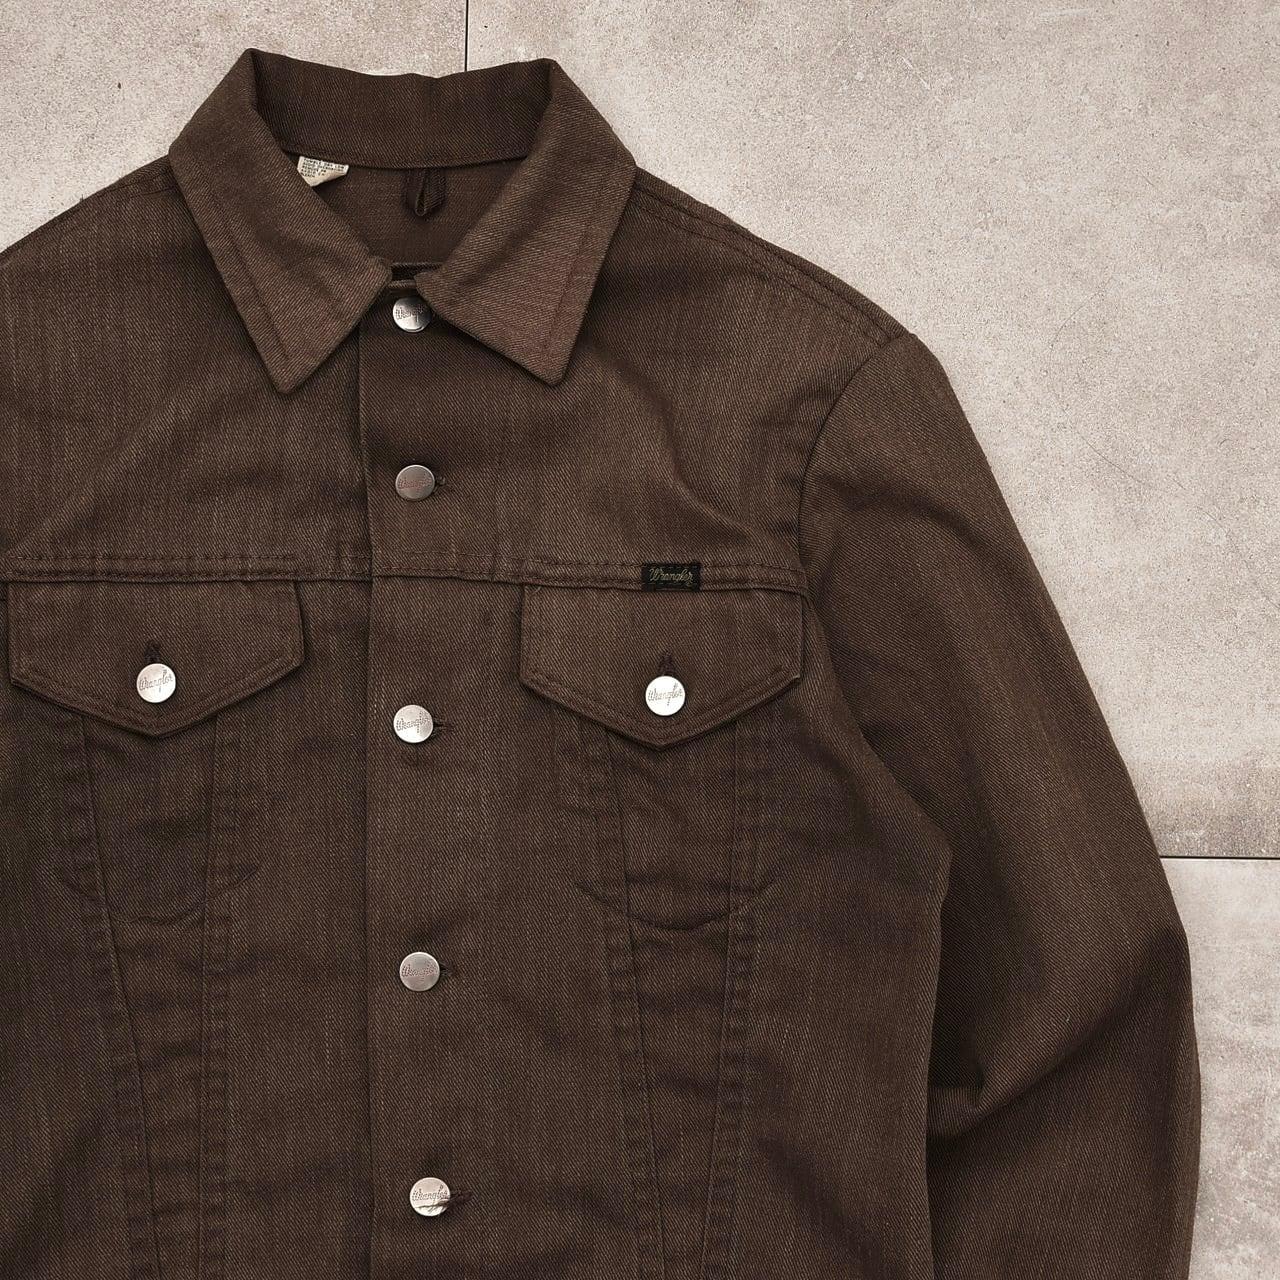 70's Wrangler 3rd type tracker jacket Made in USA